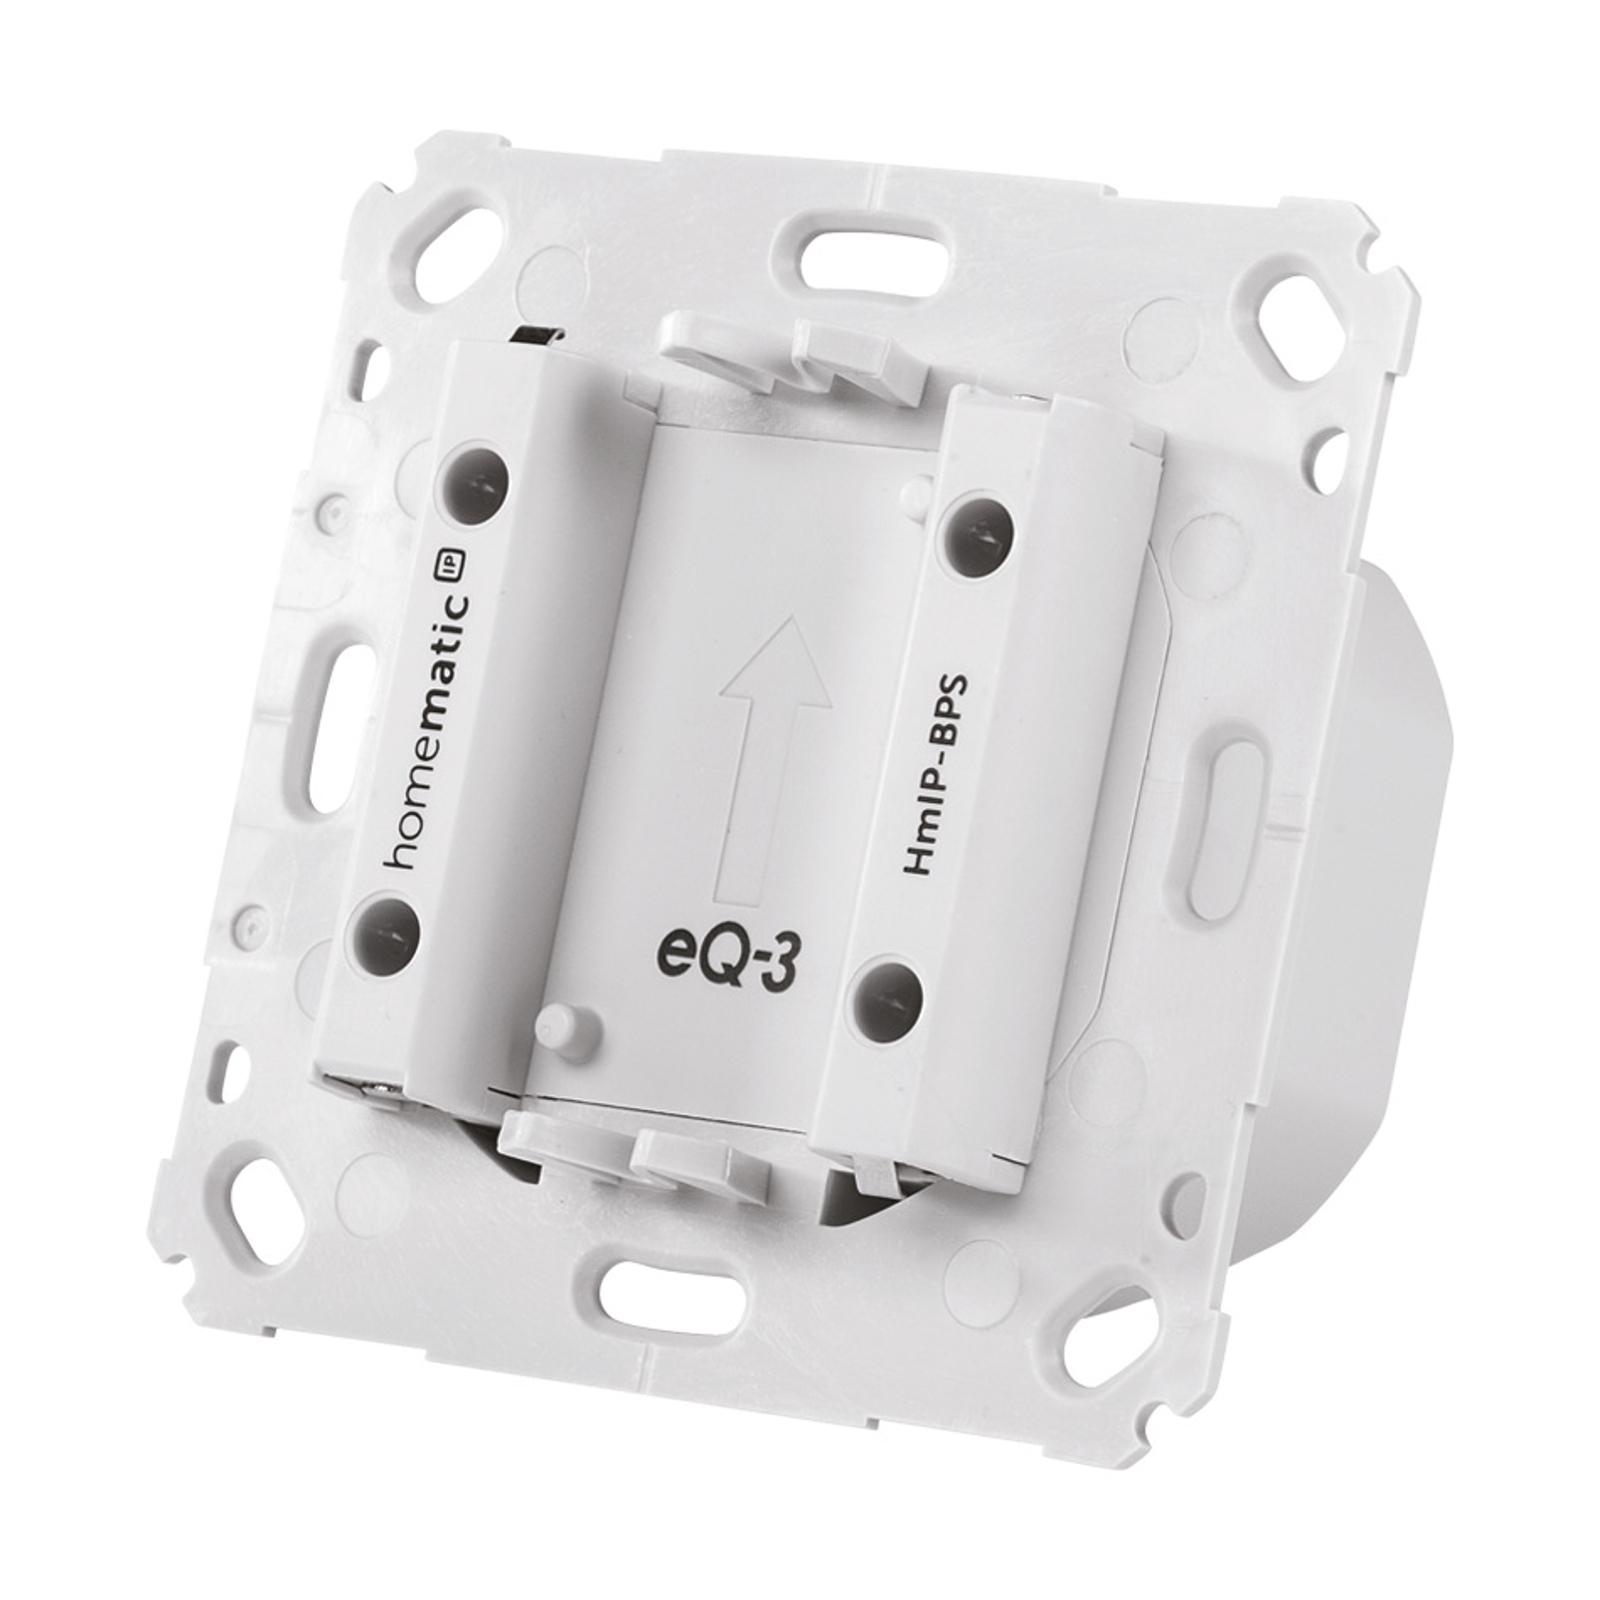 Homematic IP bloc alimentation interrupteur marque